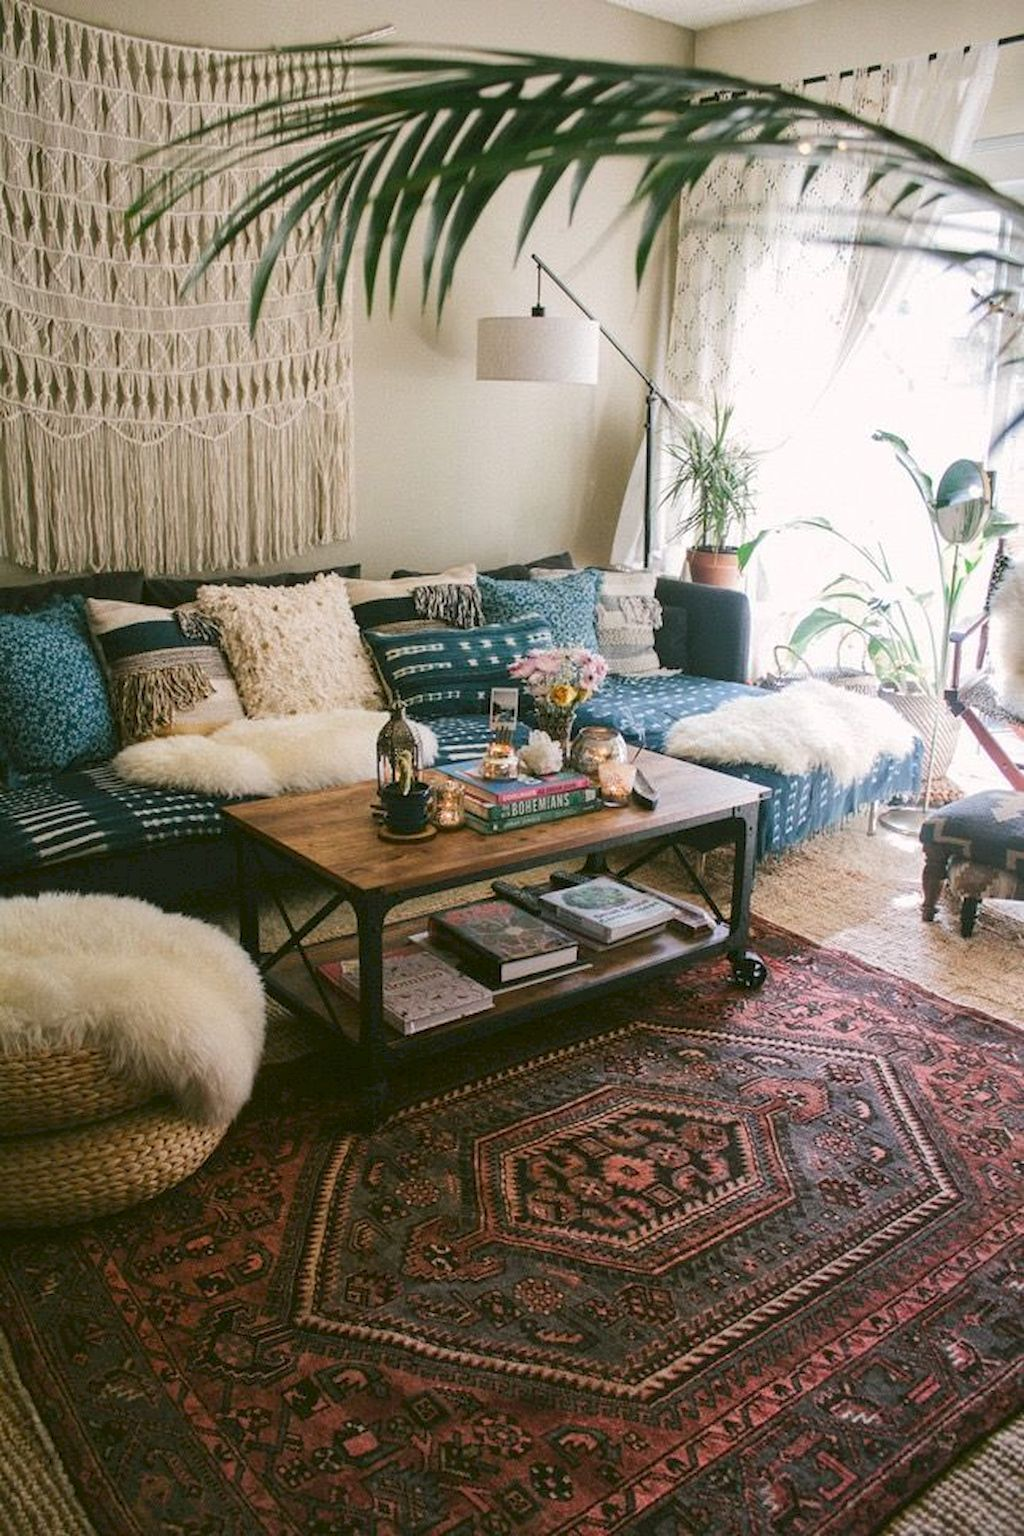 Modern bohemian living room decor ideas (19)  Bohemian living